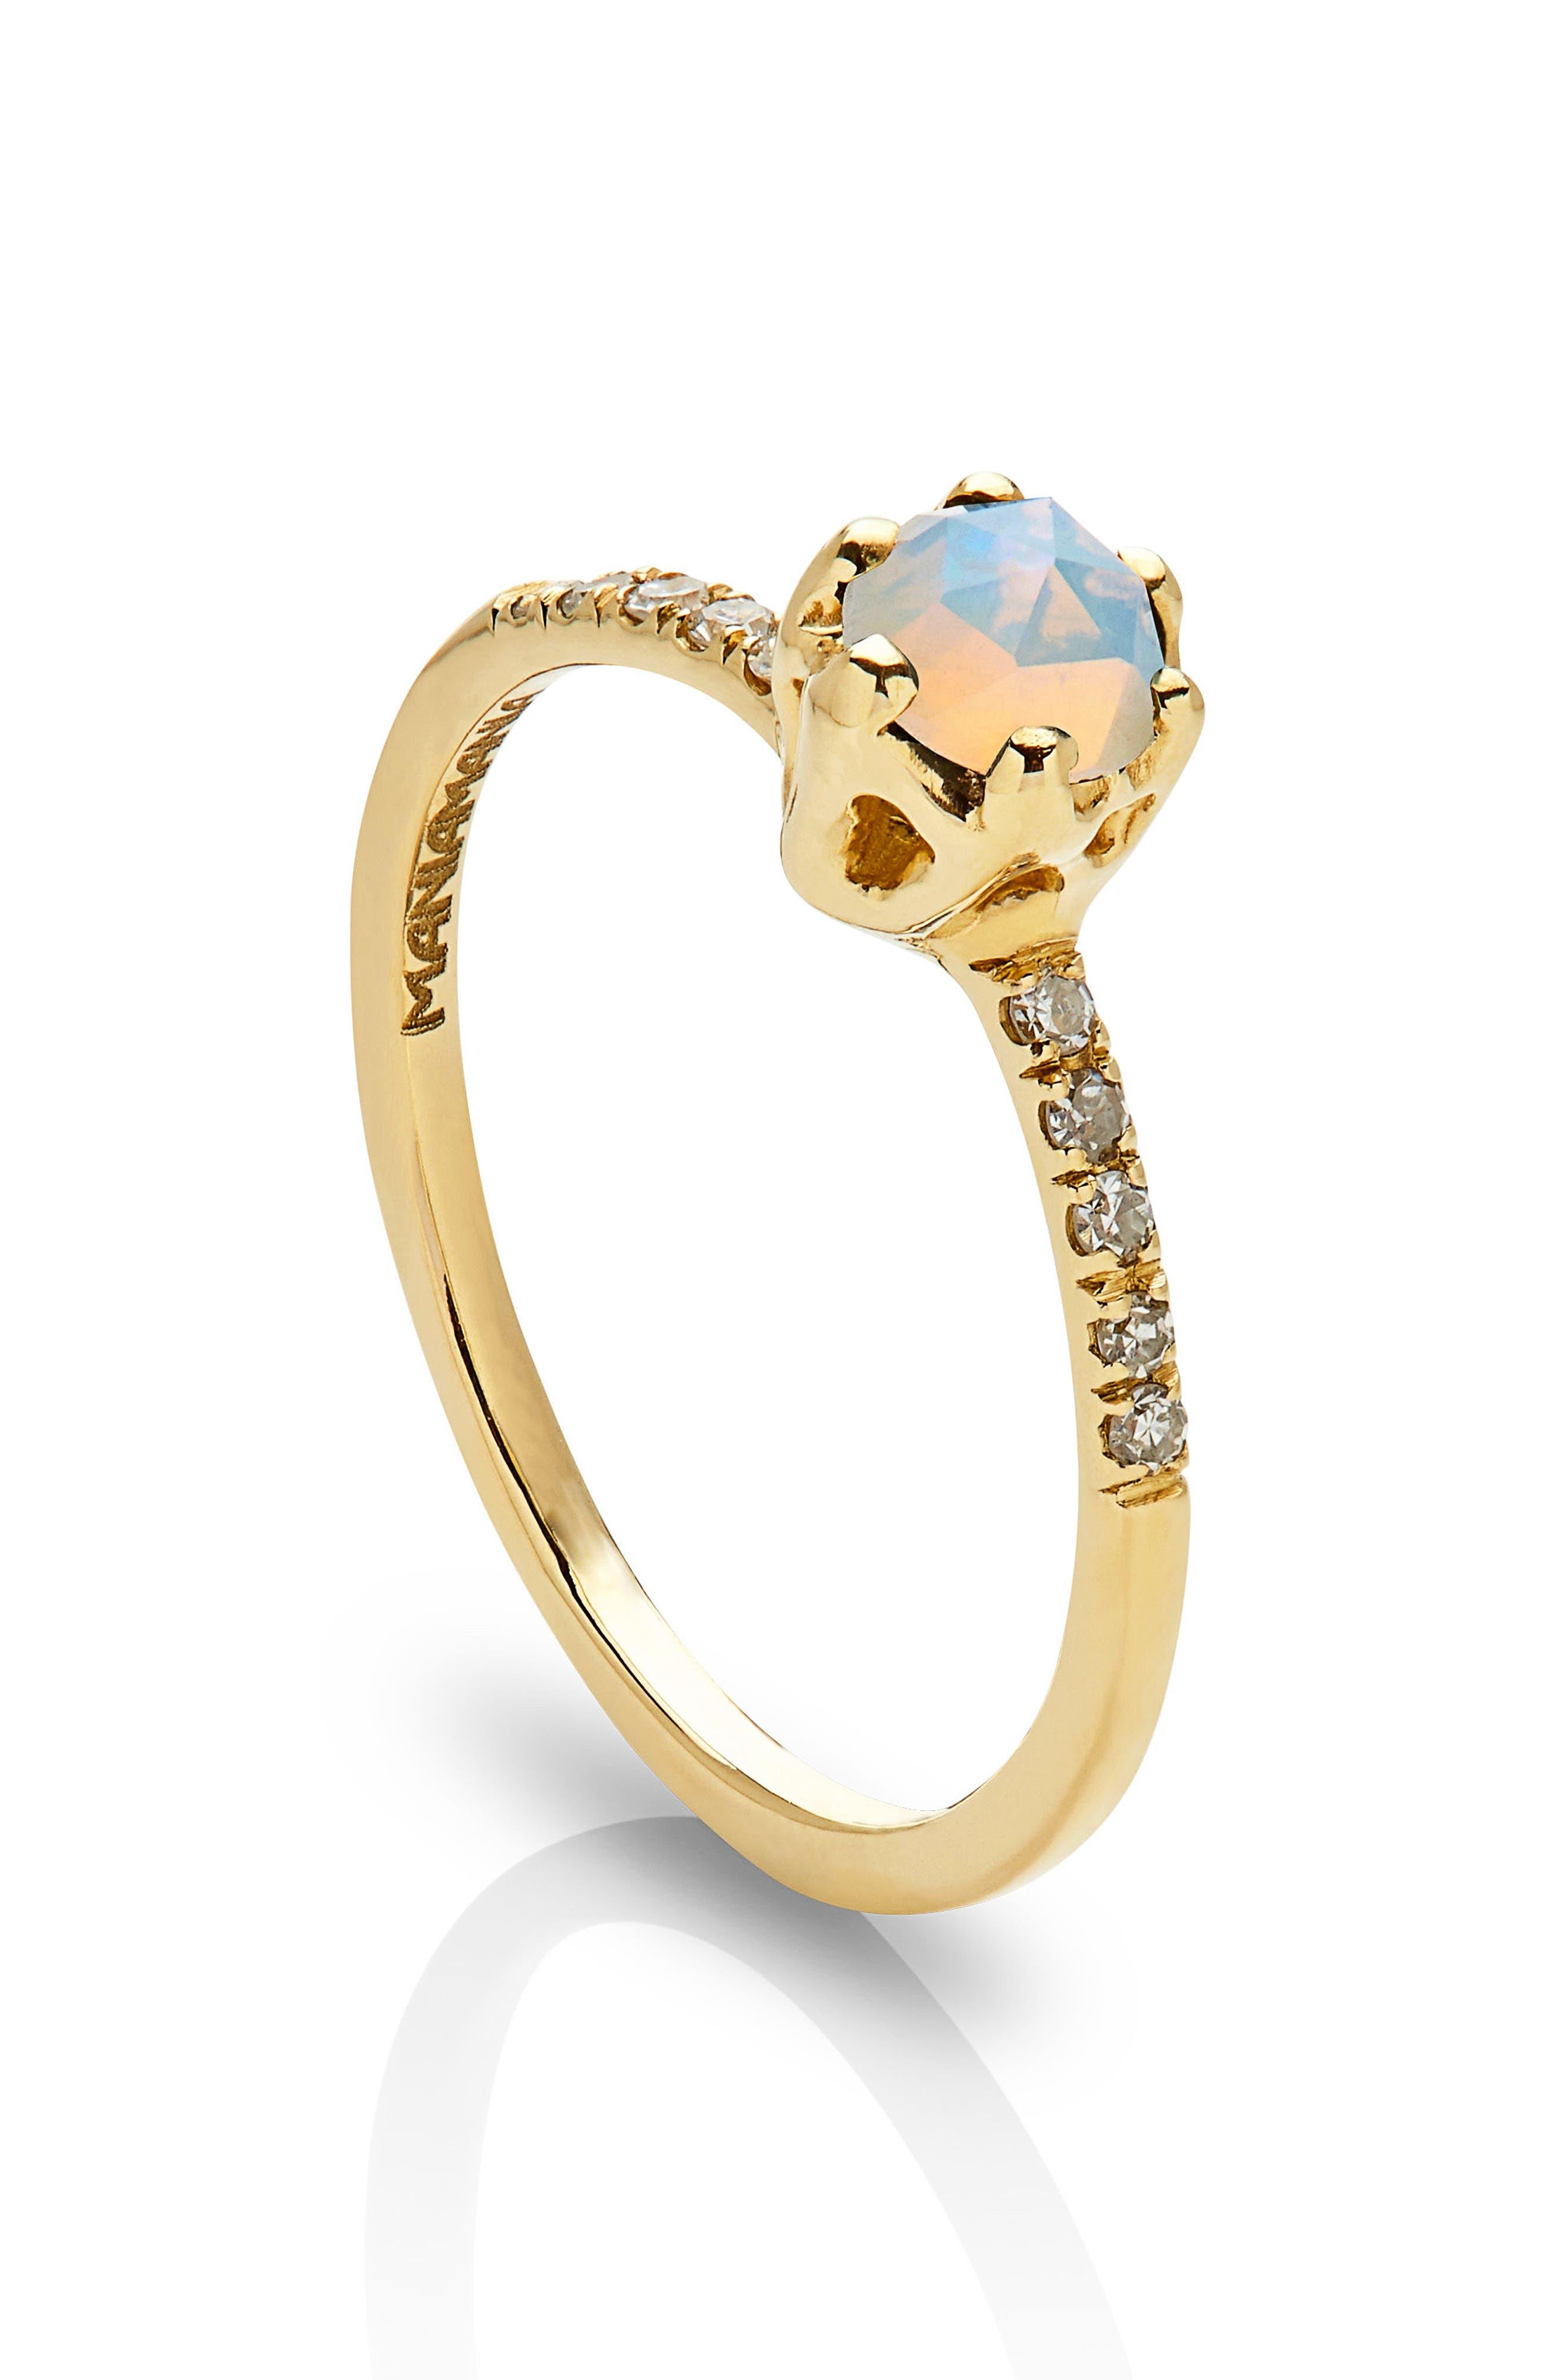 Main Image - Maniamania Entity Opal & Diamond Solitaire Ring